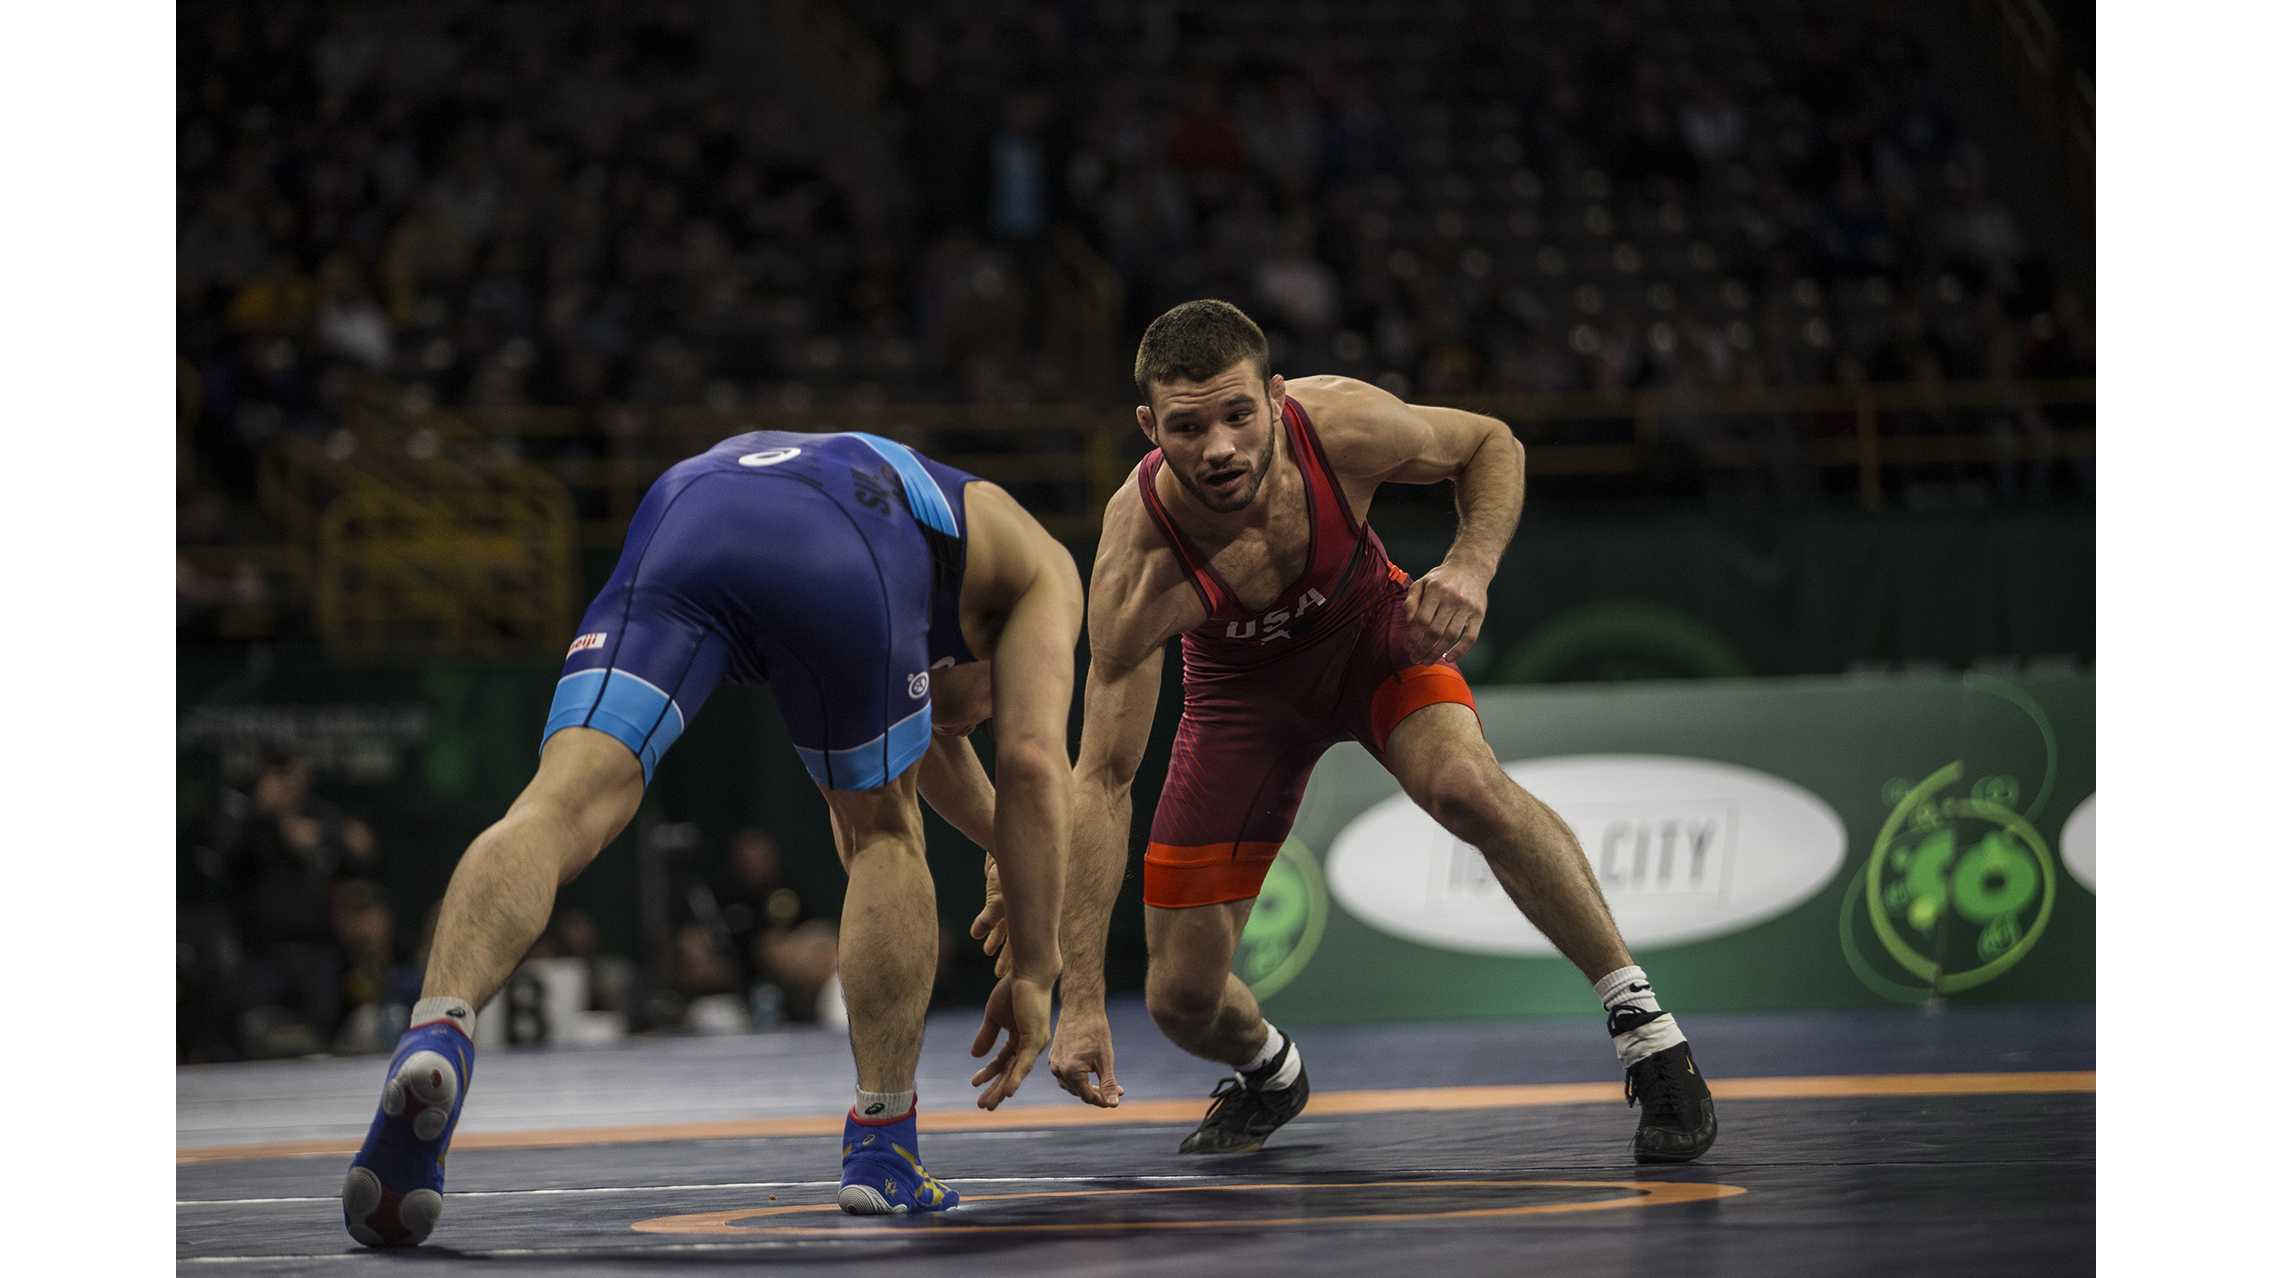 Gilman falls, but USA downs Japan, 7-3